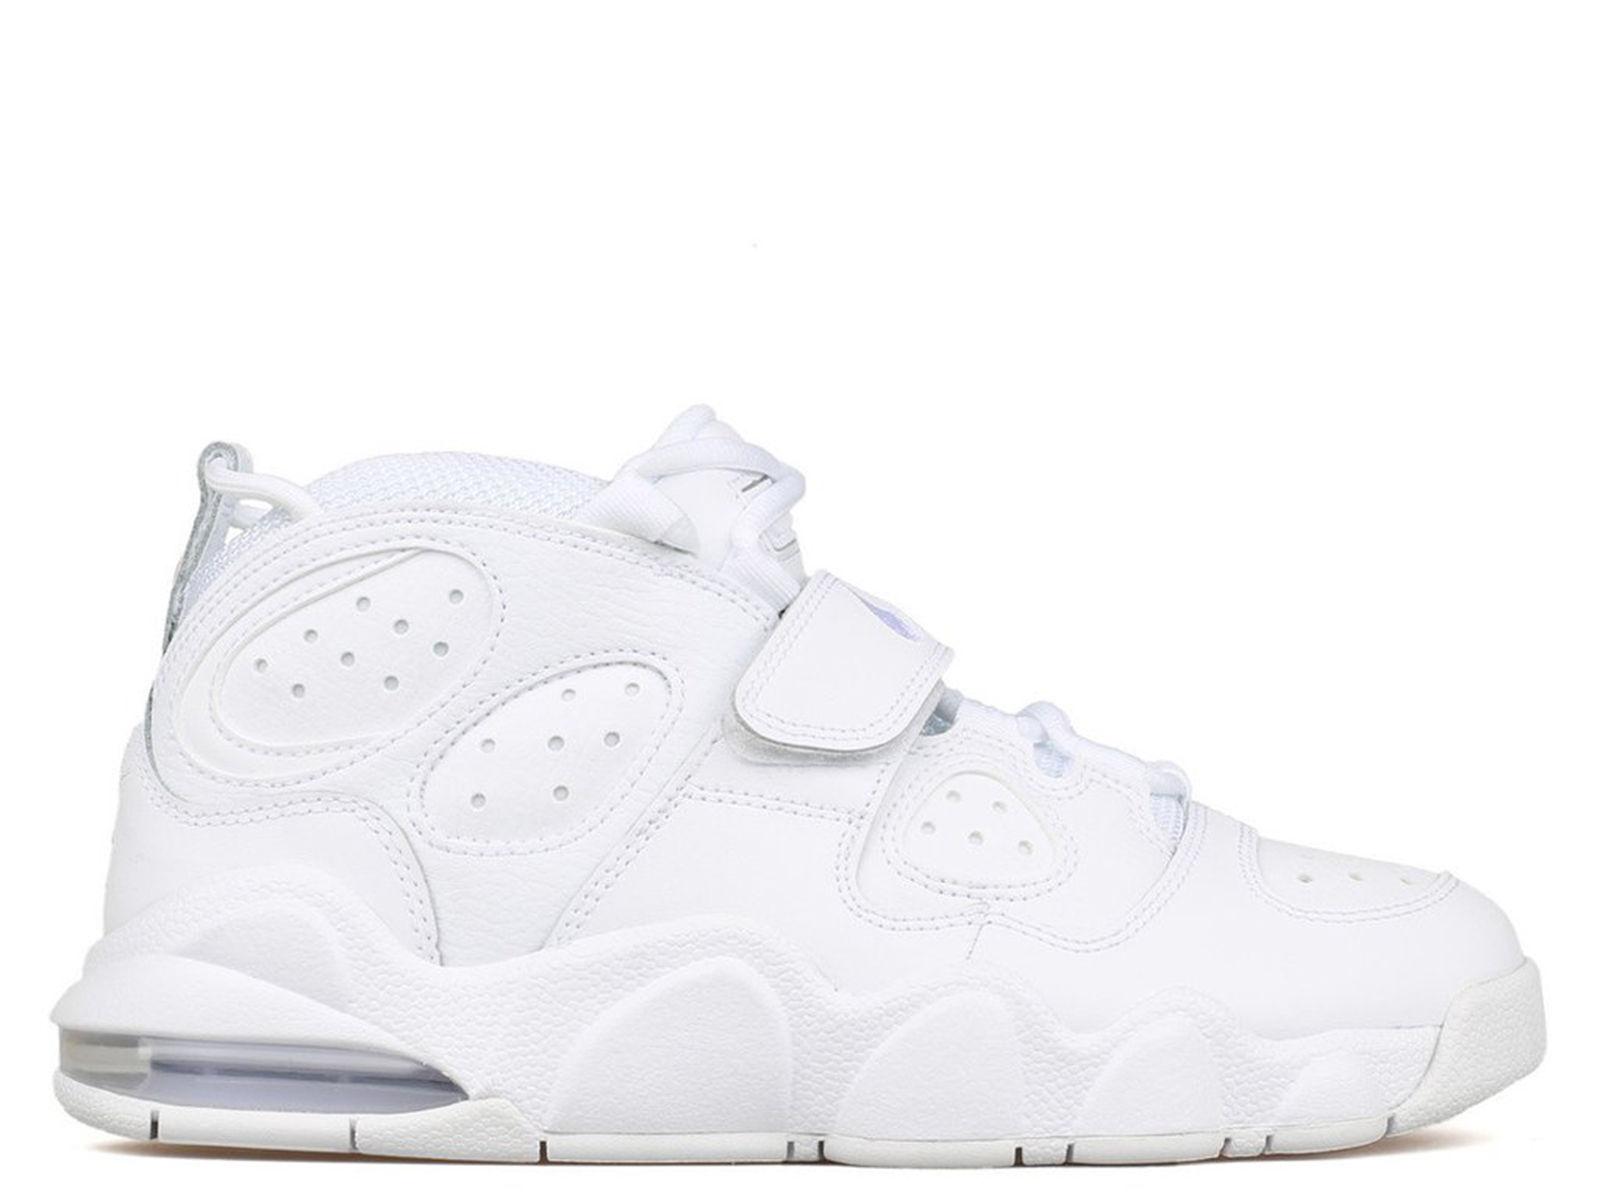 Nike Men's Air CB 34 White Retro Price reduction  Cheap women's shoes women's shoes